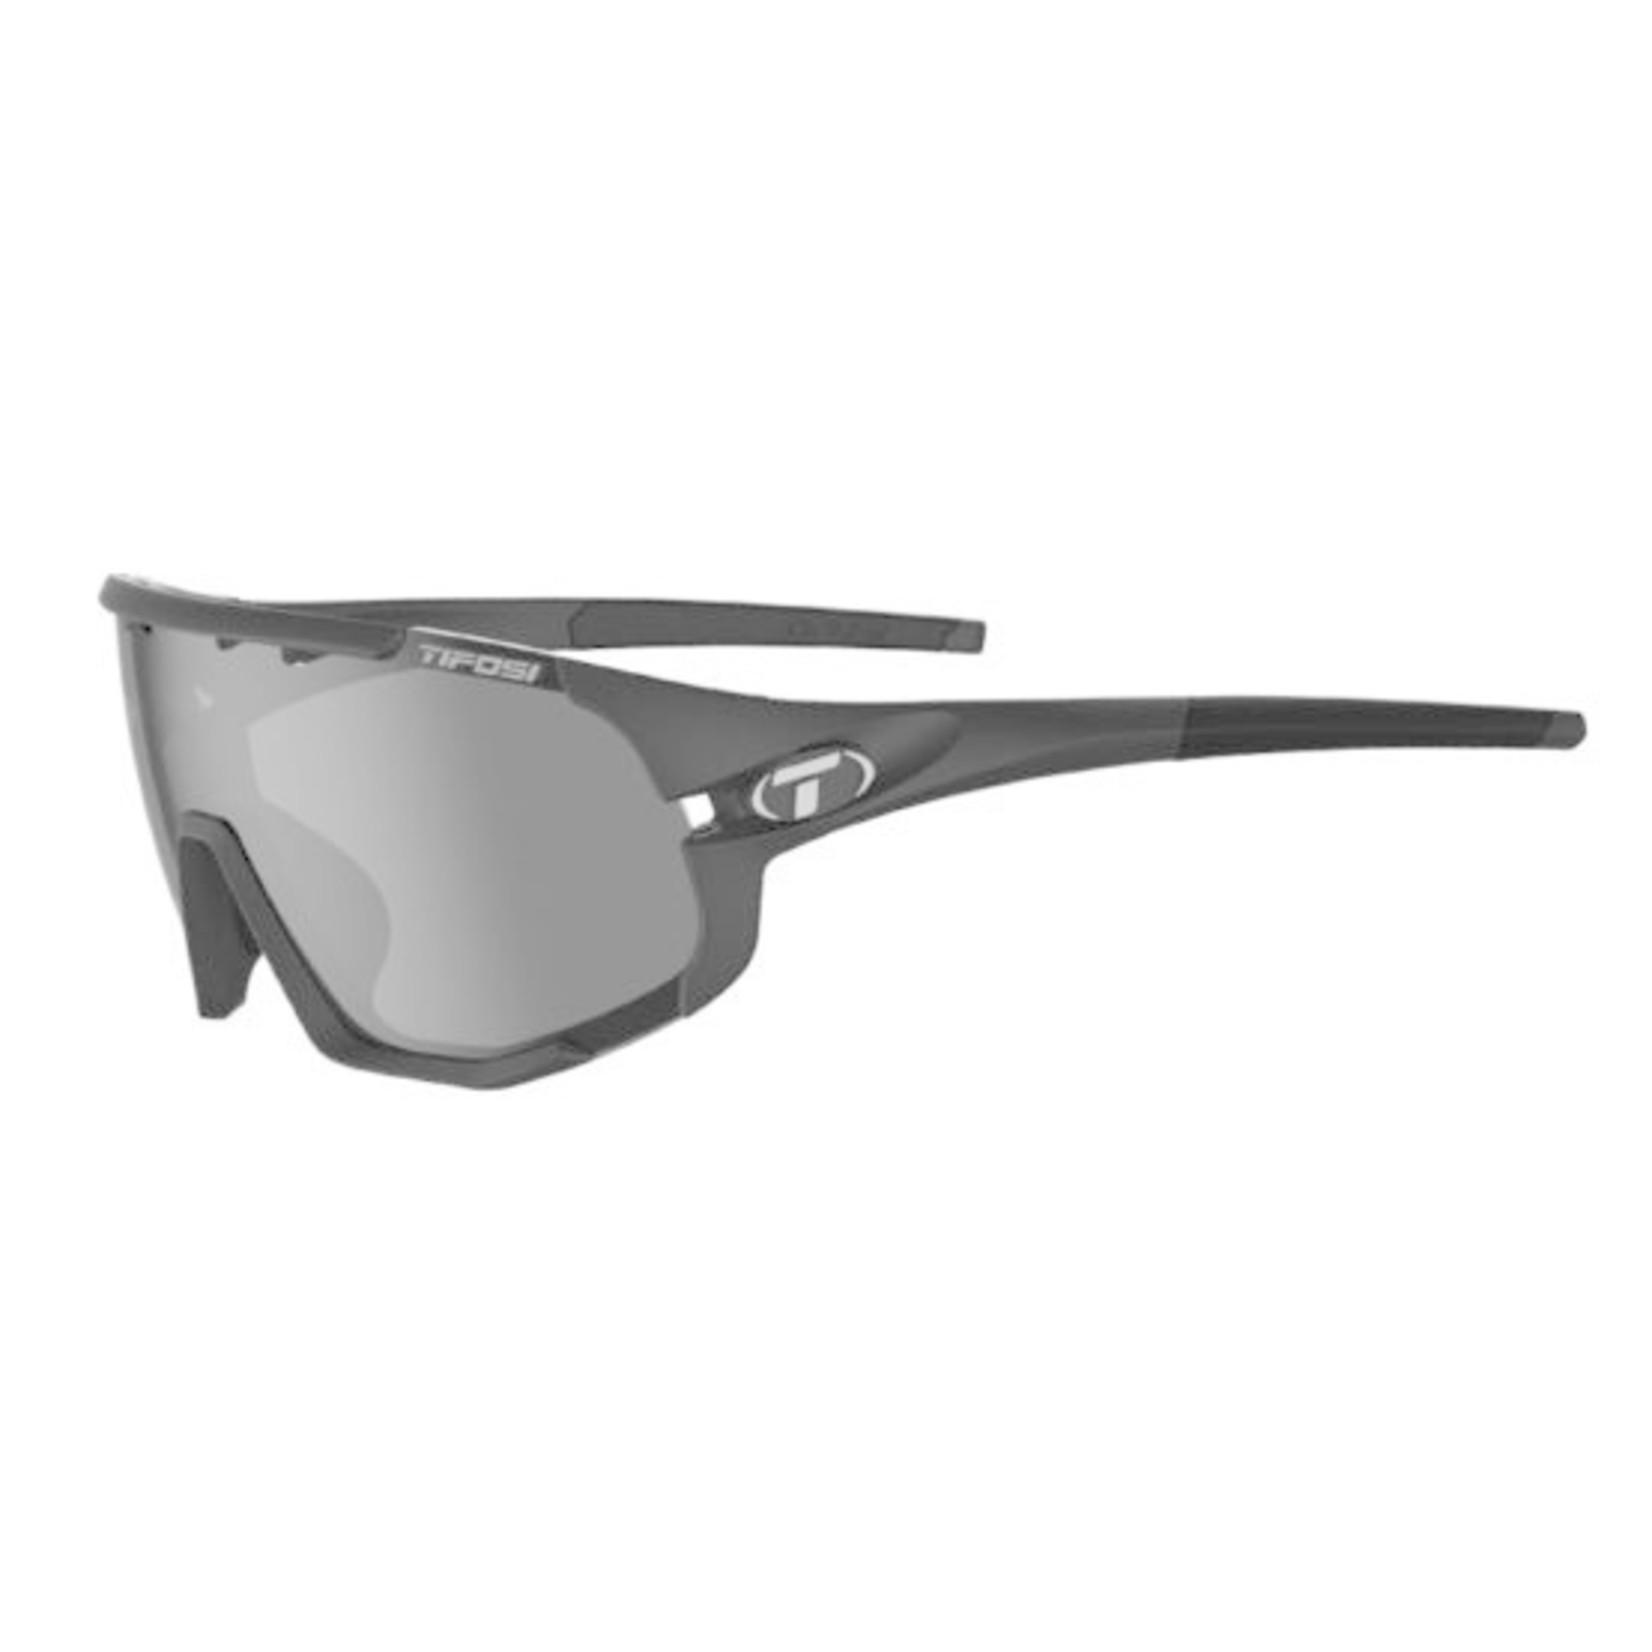 Tifosi Optics Sledge, Matte Black Interchangeable Sunglasses